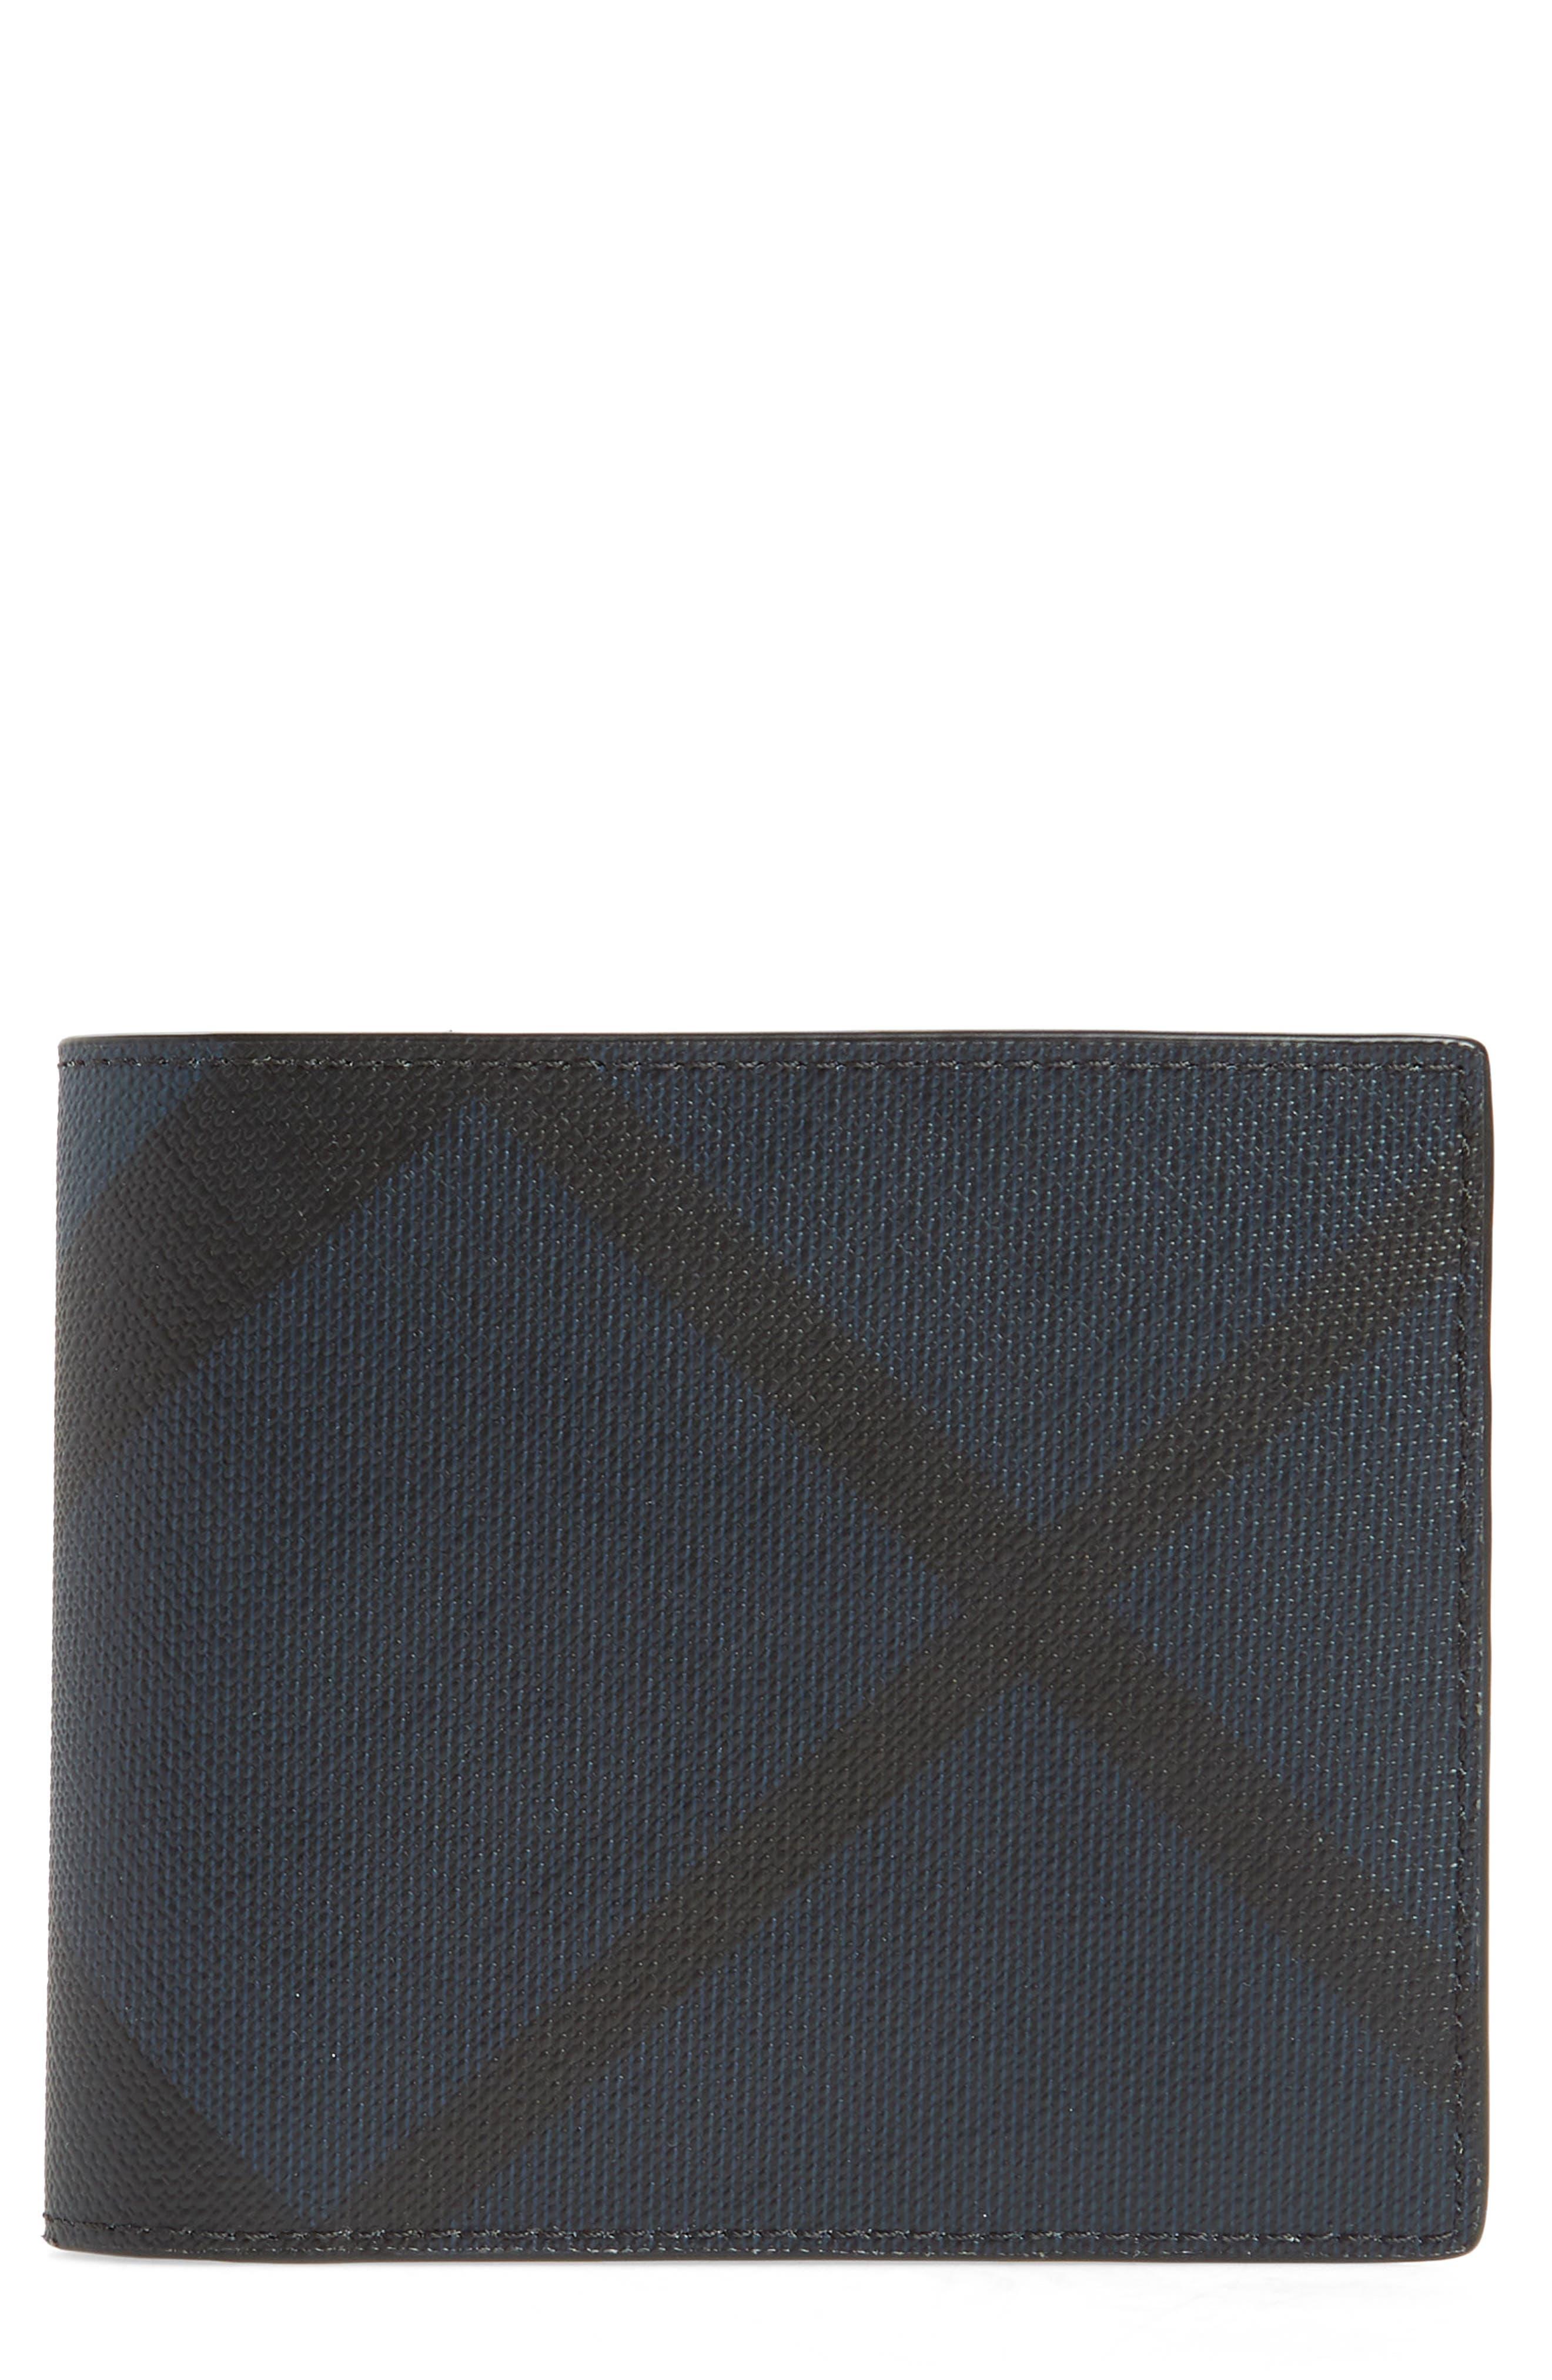 Ronan Check Billfold Wallet,                         Main,                         color, Navy/ Black